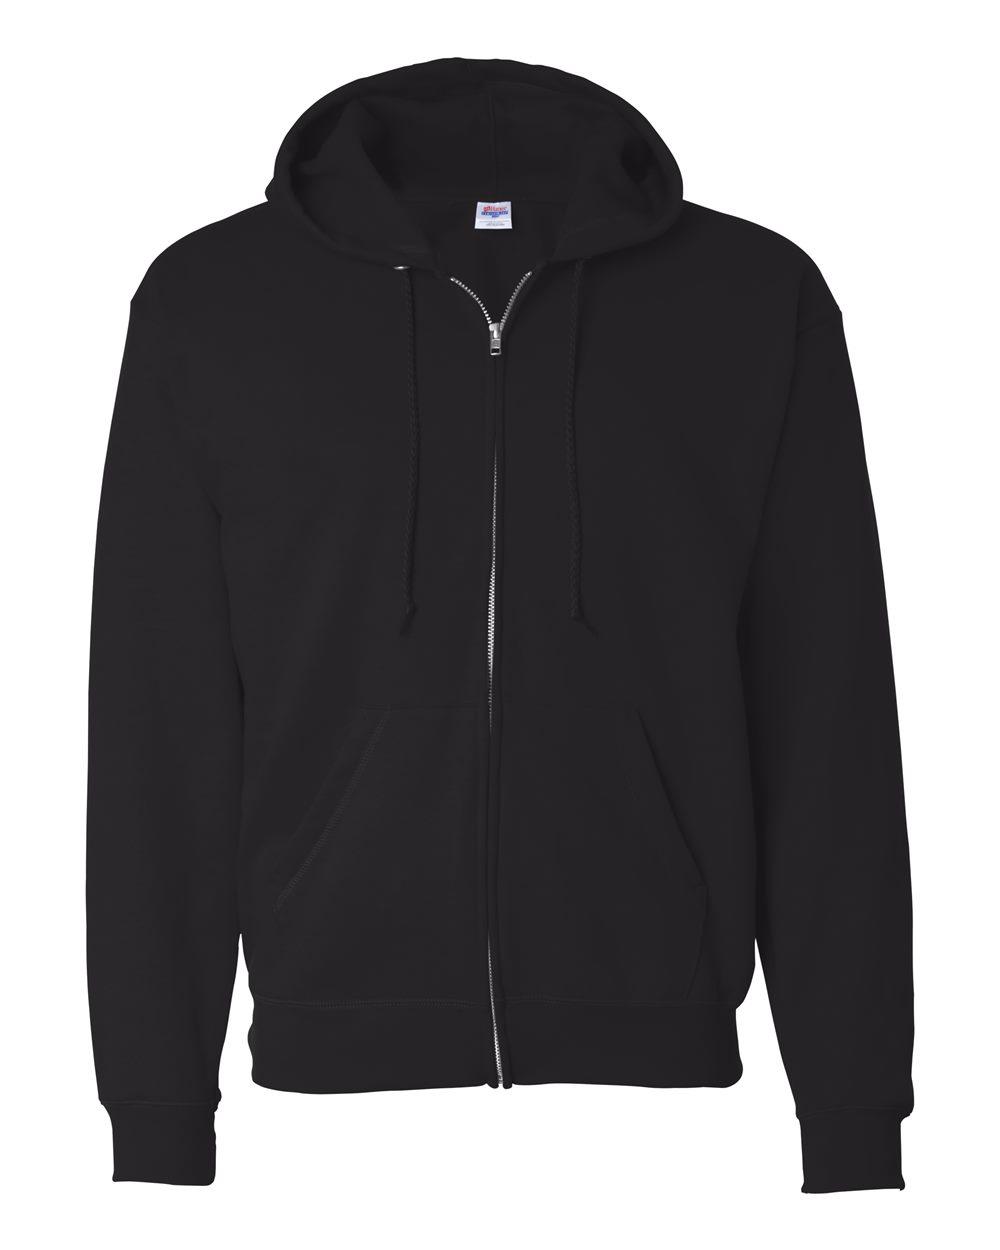 Hanes-Mens-Ecosmart-Blend-Full-Zip-Hooded-Sweatshirt-P180-up-to-3XL miniature 6